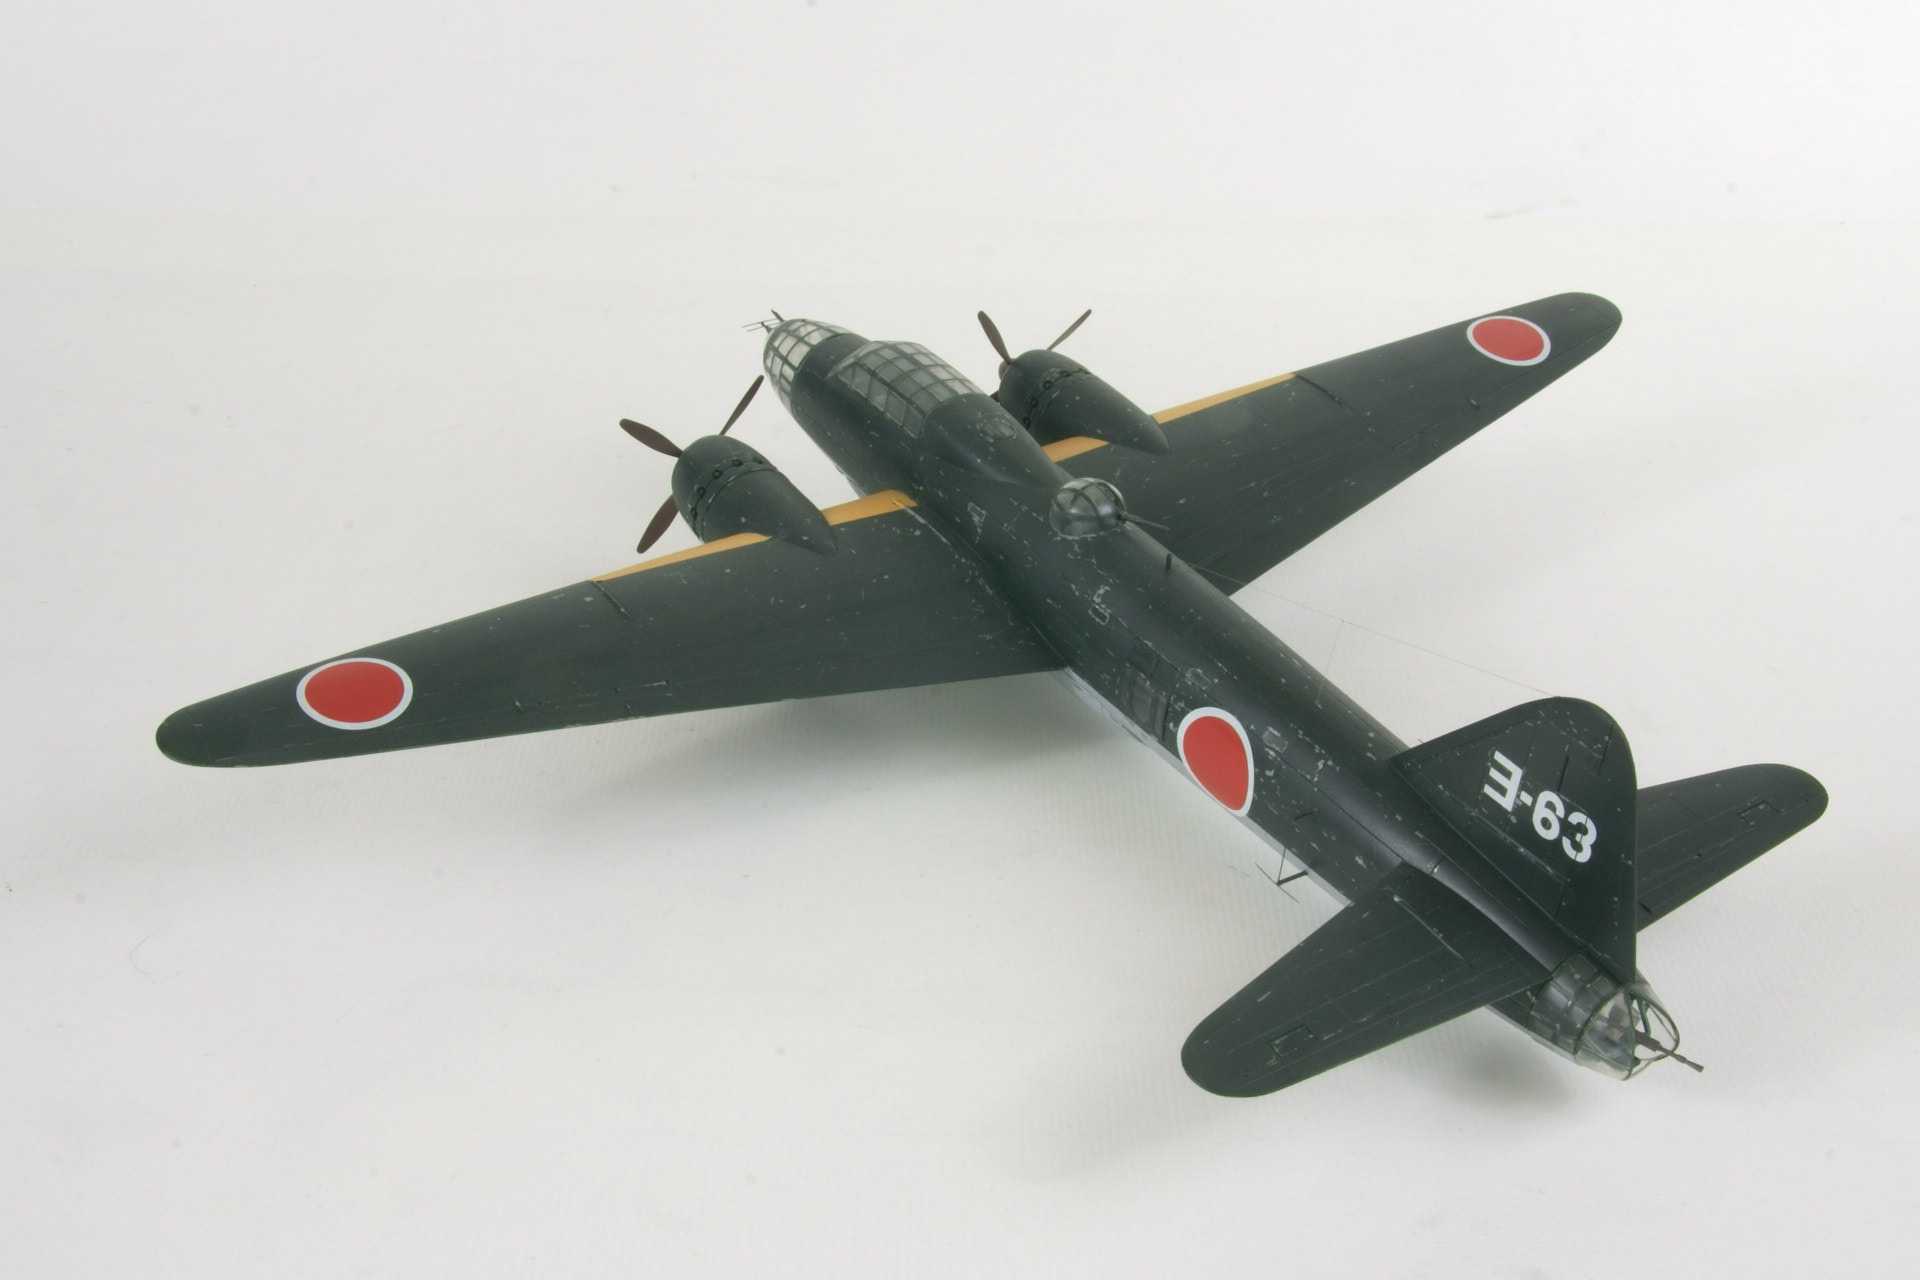 Mitsubishi g4m2a model 24 betty 2 1